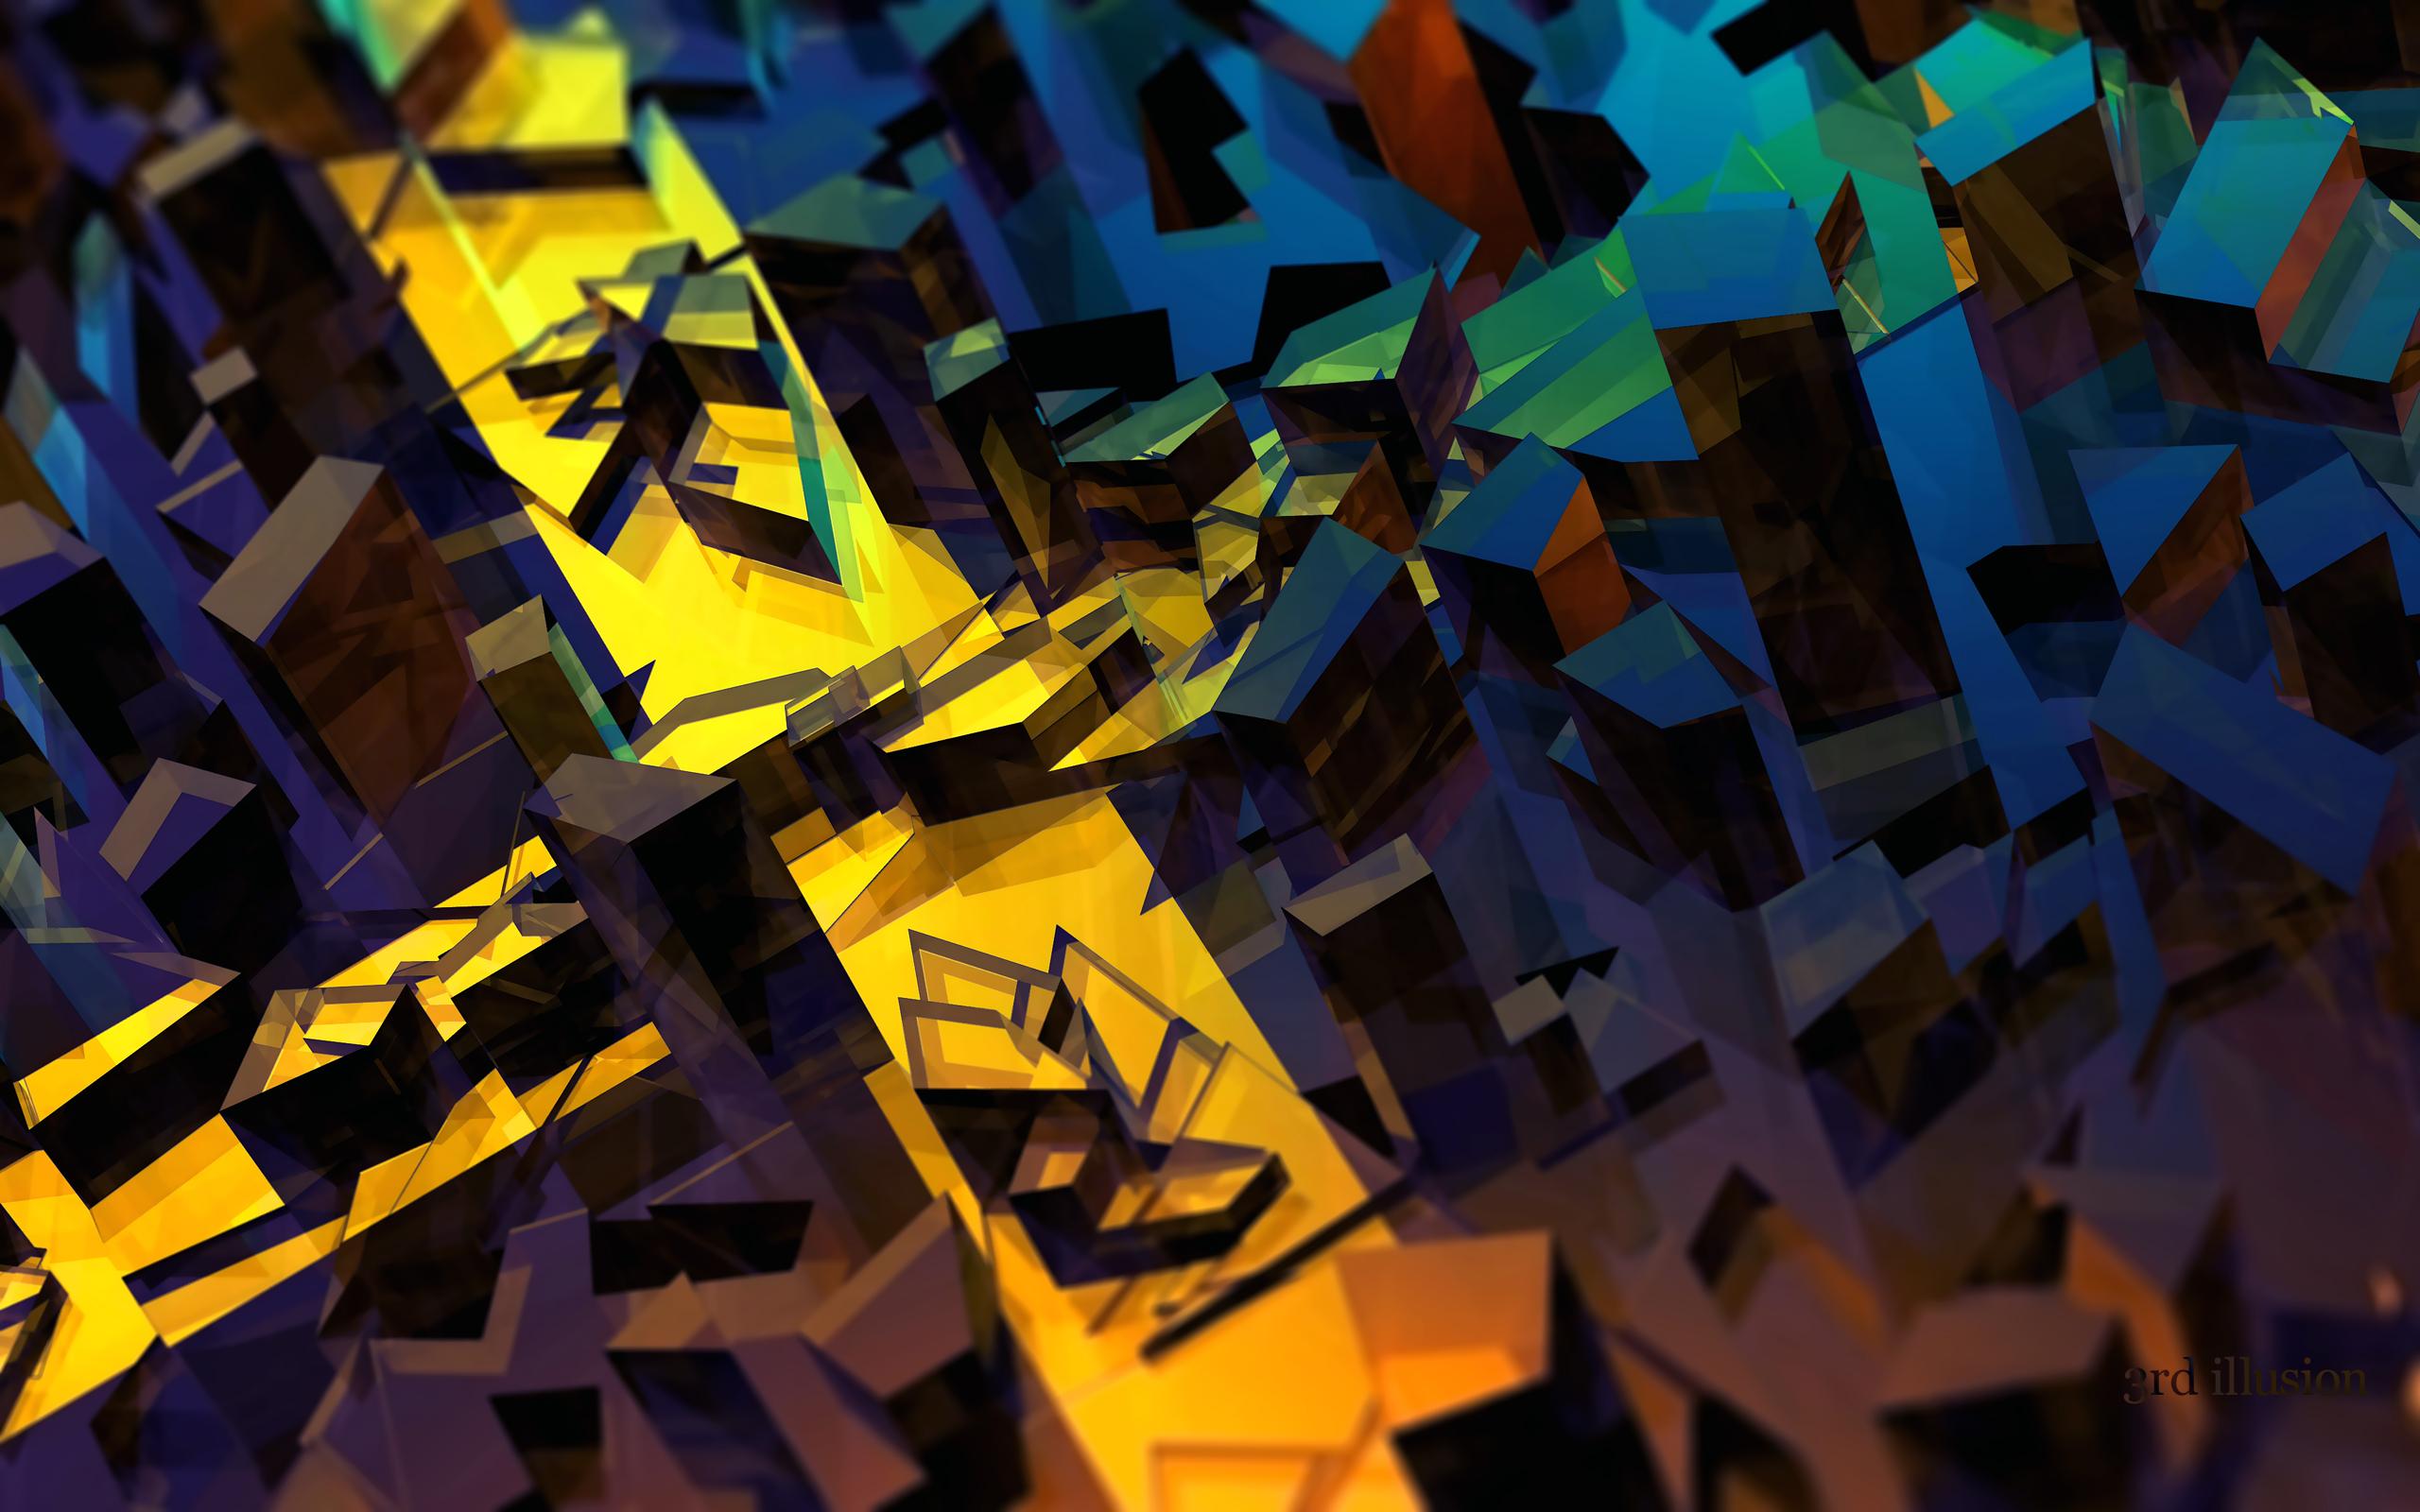 3i : qor spectra by 3rdillusion